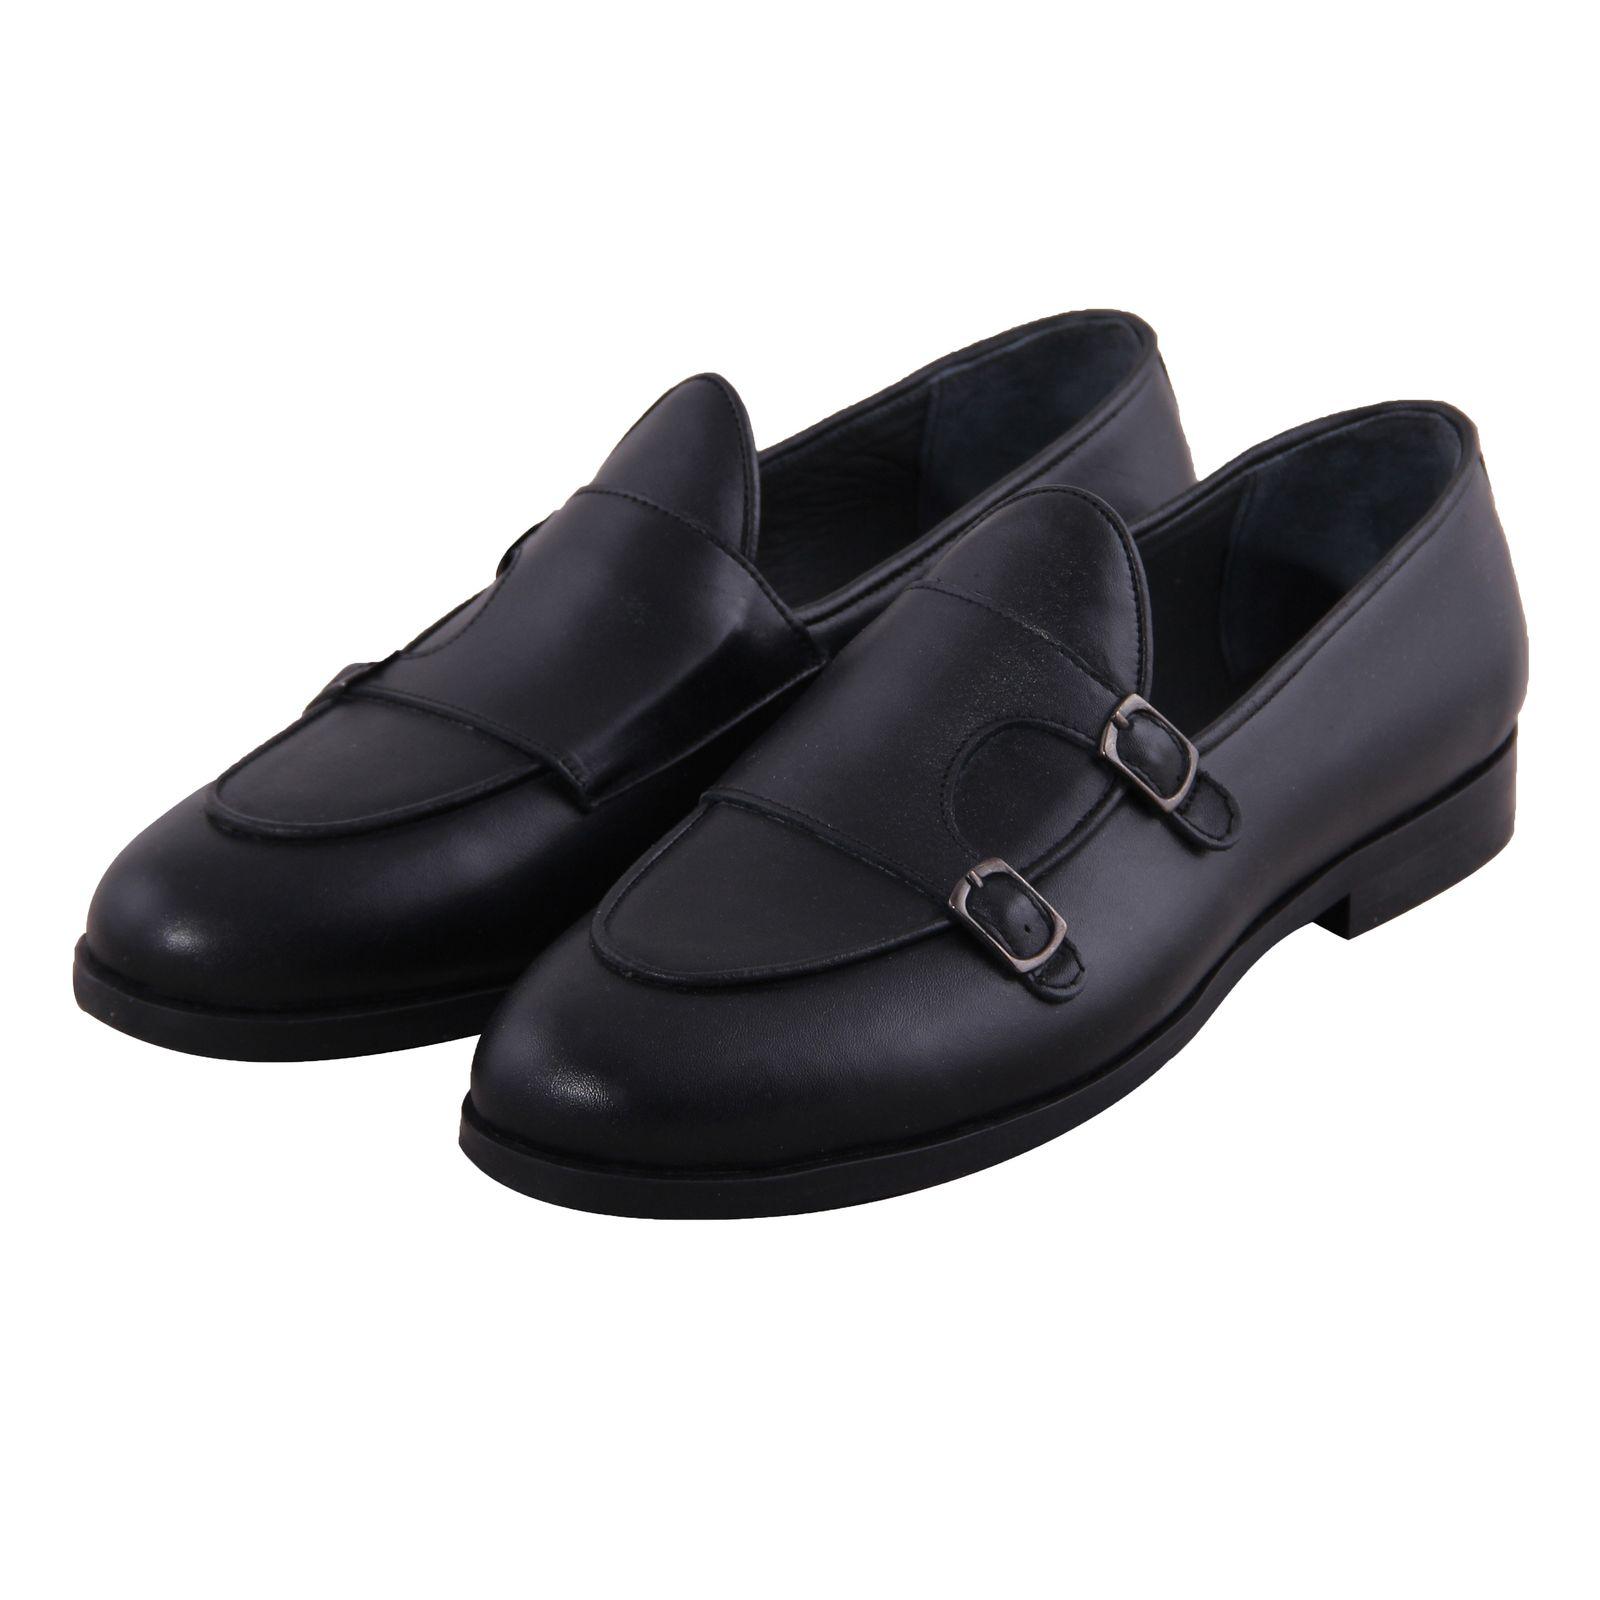 کفش مردانه شهر چرم مدل S961-1 -  - 6